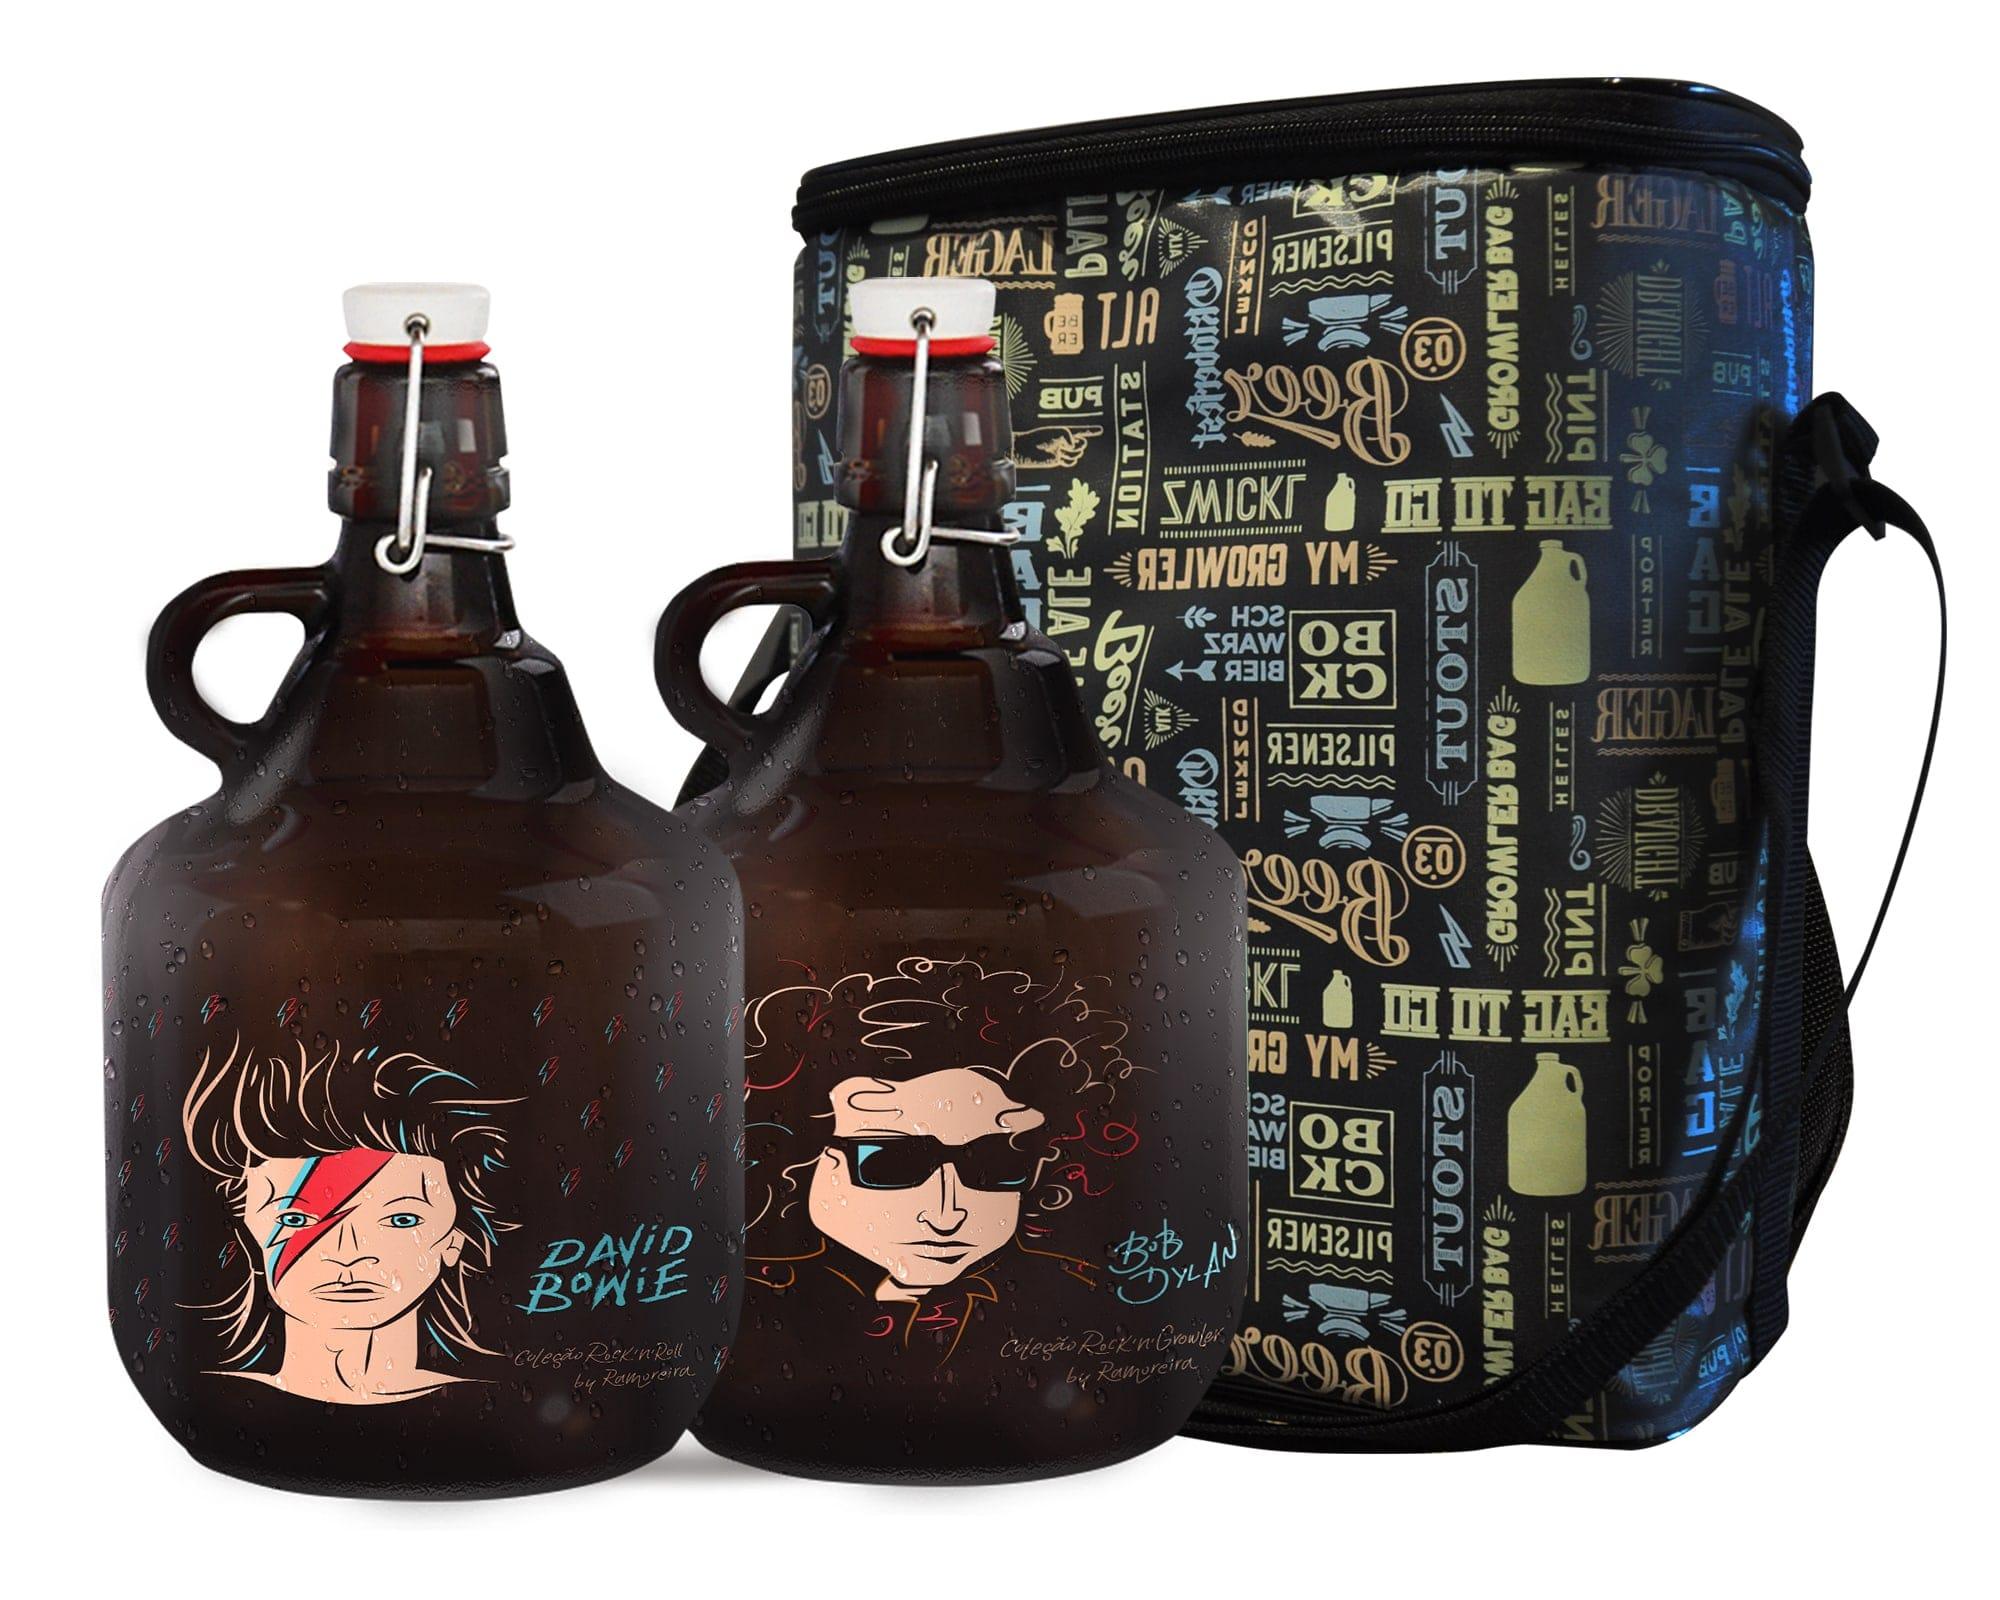 KIT TO GO #3: Grand Growler 2l  Bob Dylan & David Bowie + Growler Bag To Go para 2 growlers